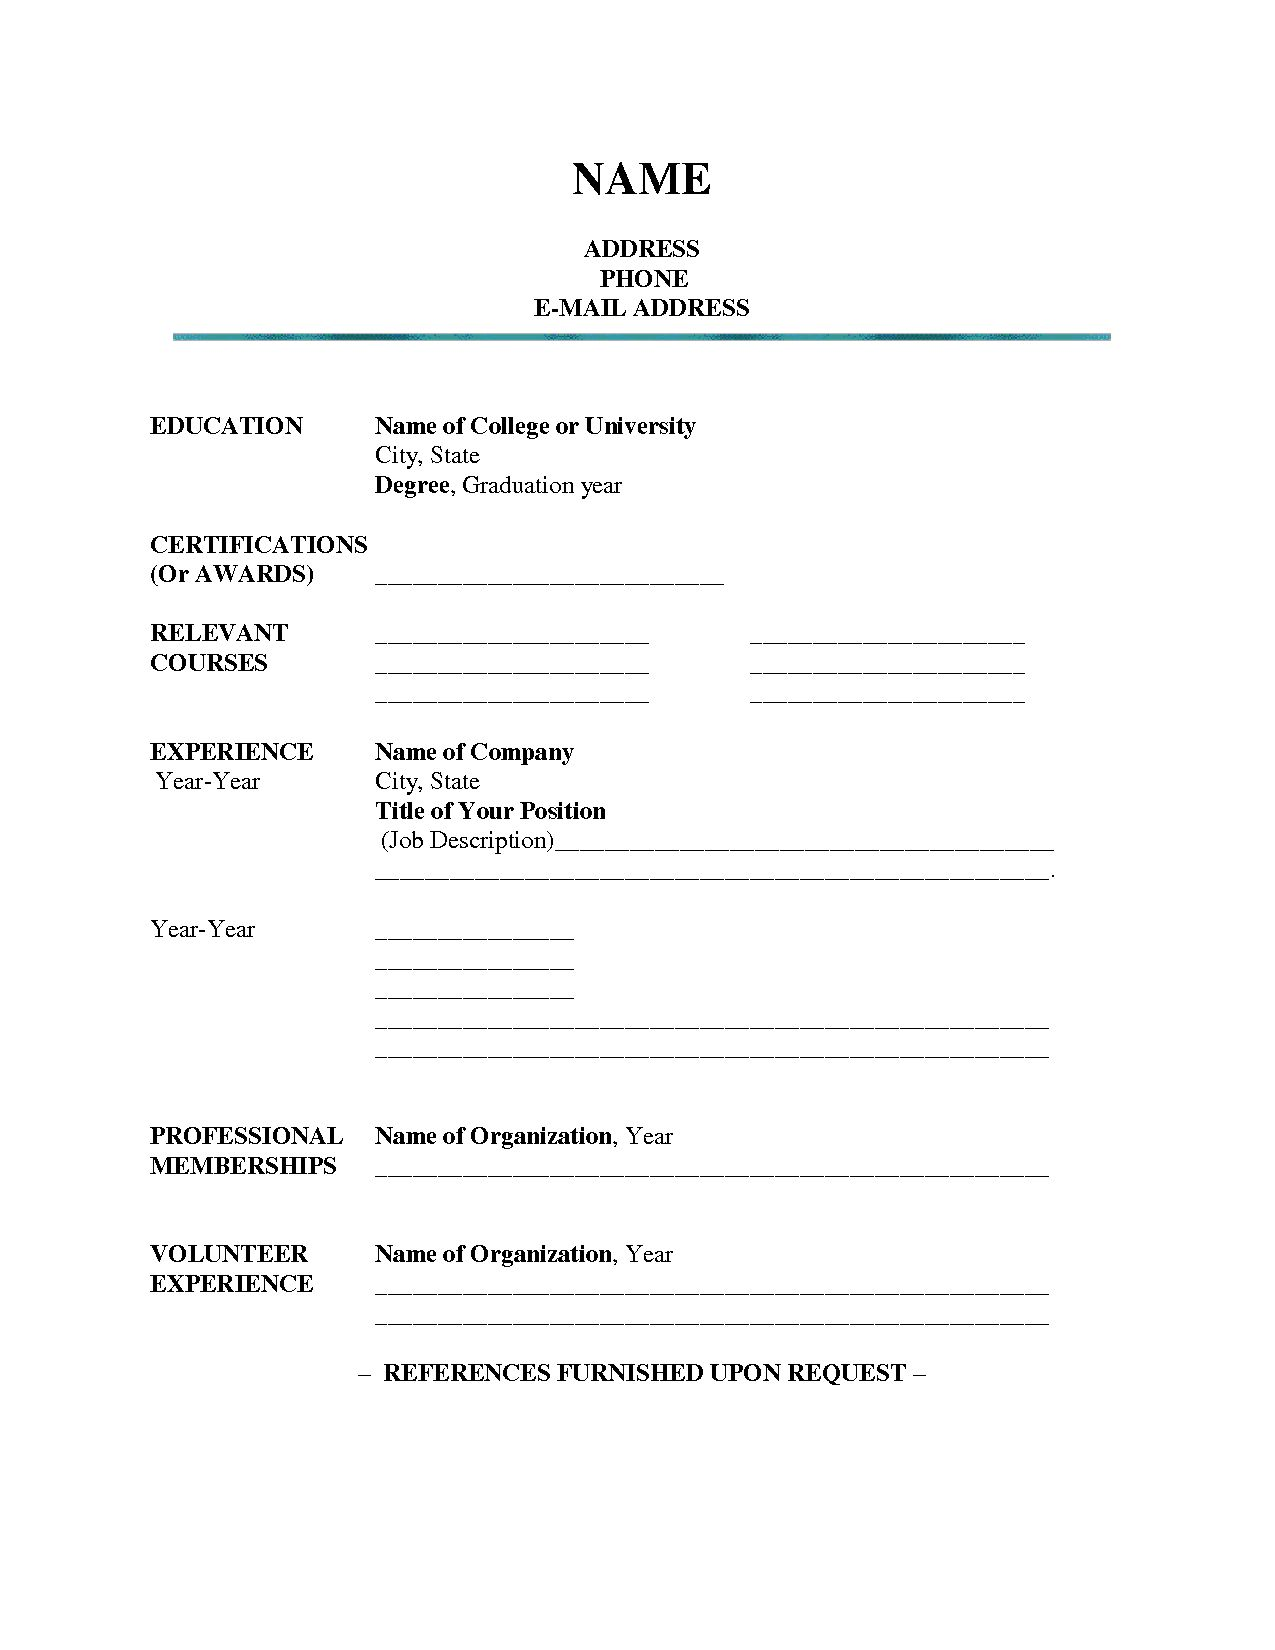 Resume Format Blank , blank format resume ResumeFormat